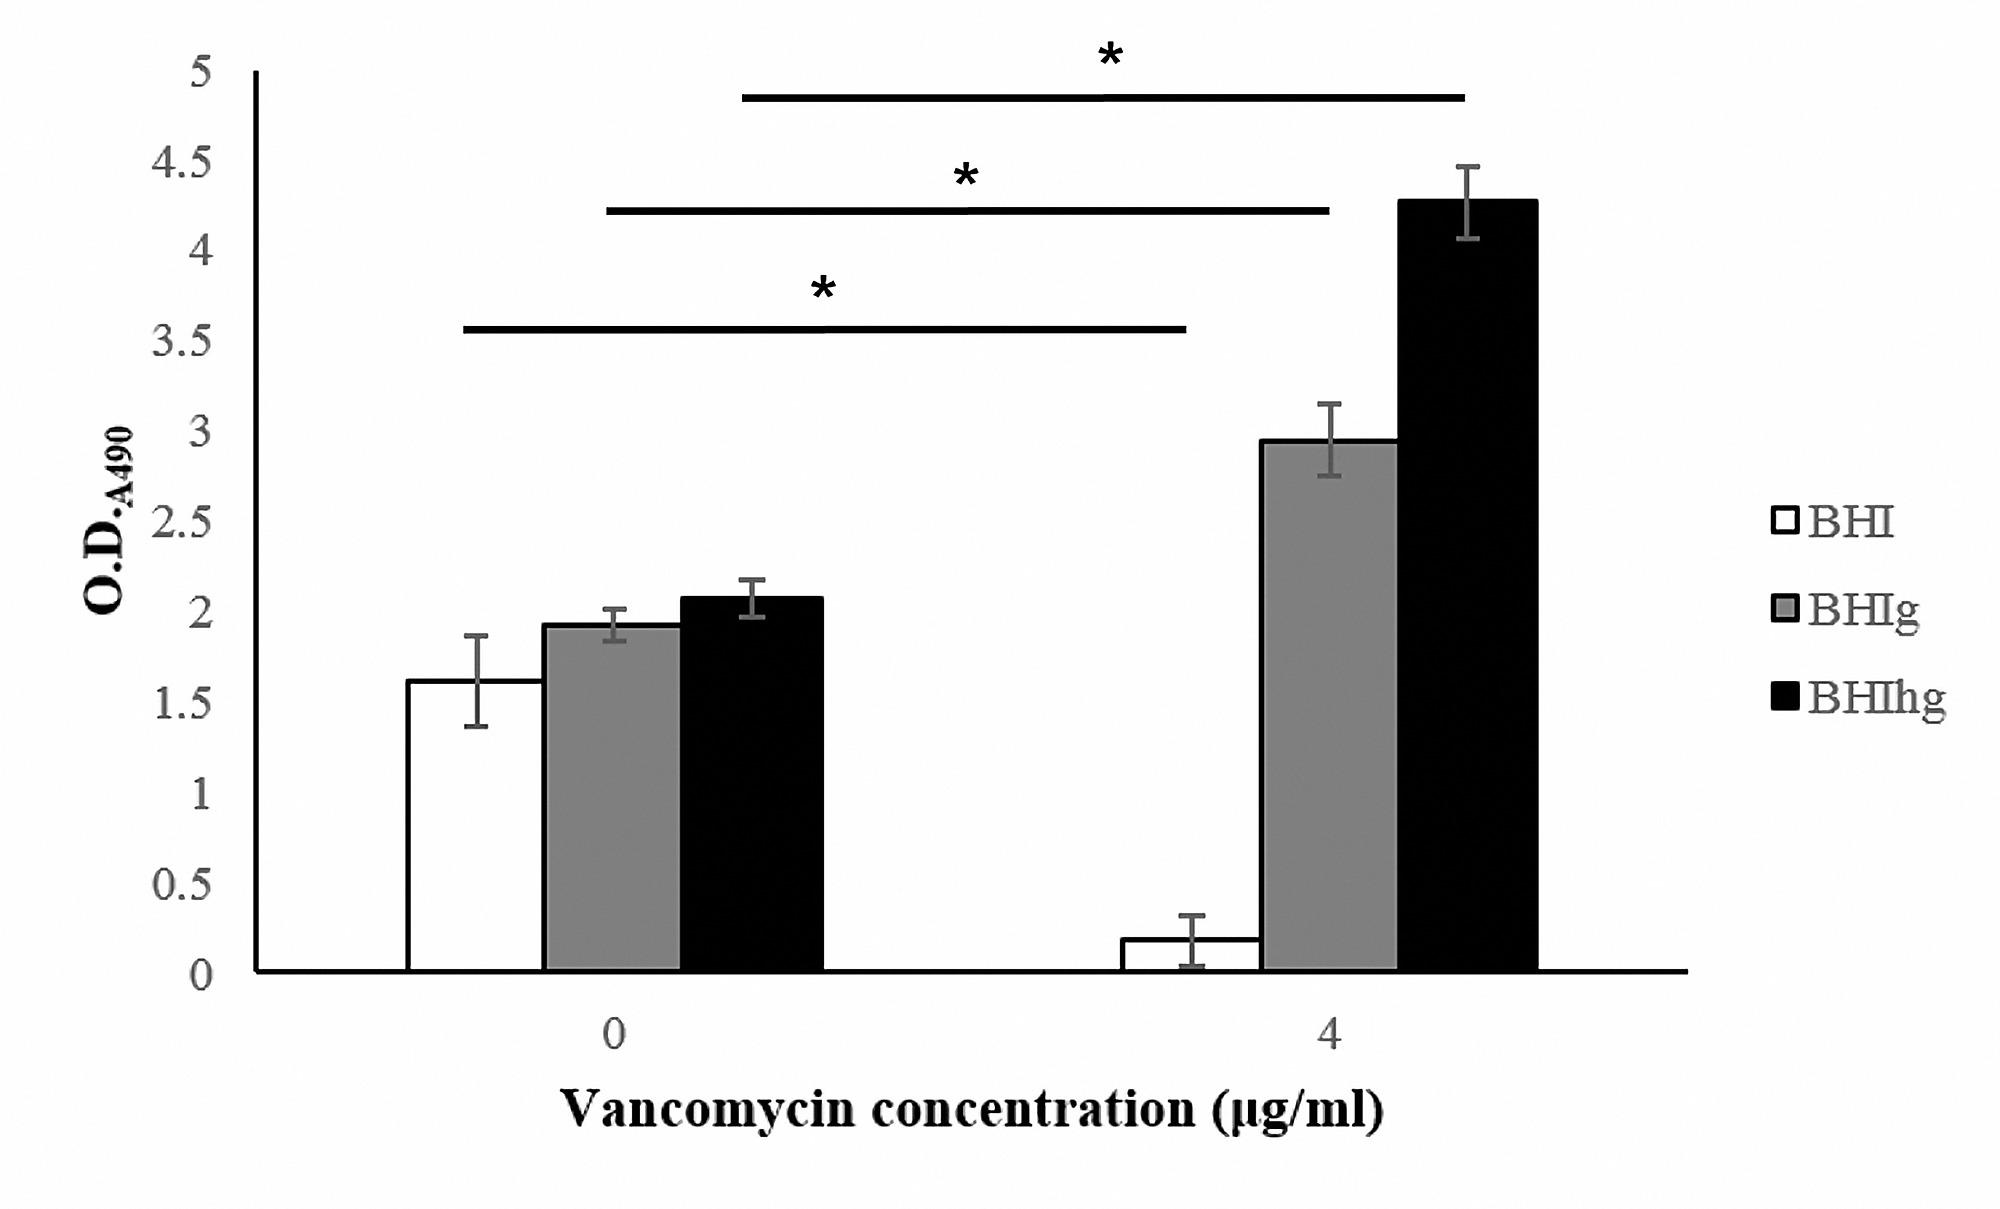 High Glucose Concentration Promotes Vancomycin-Enhanced